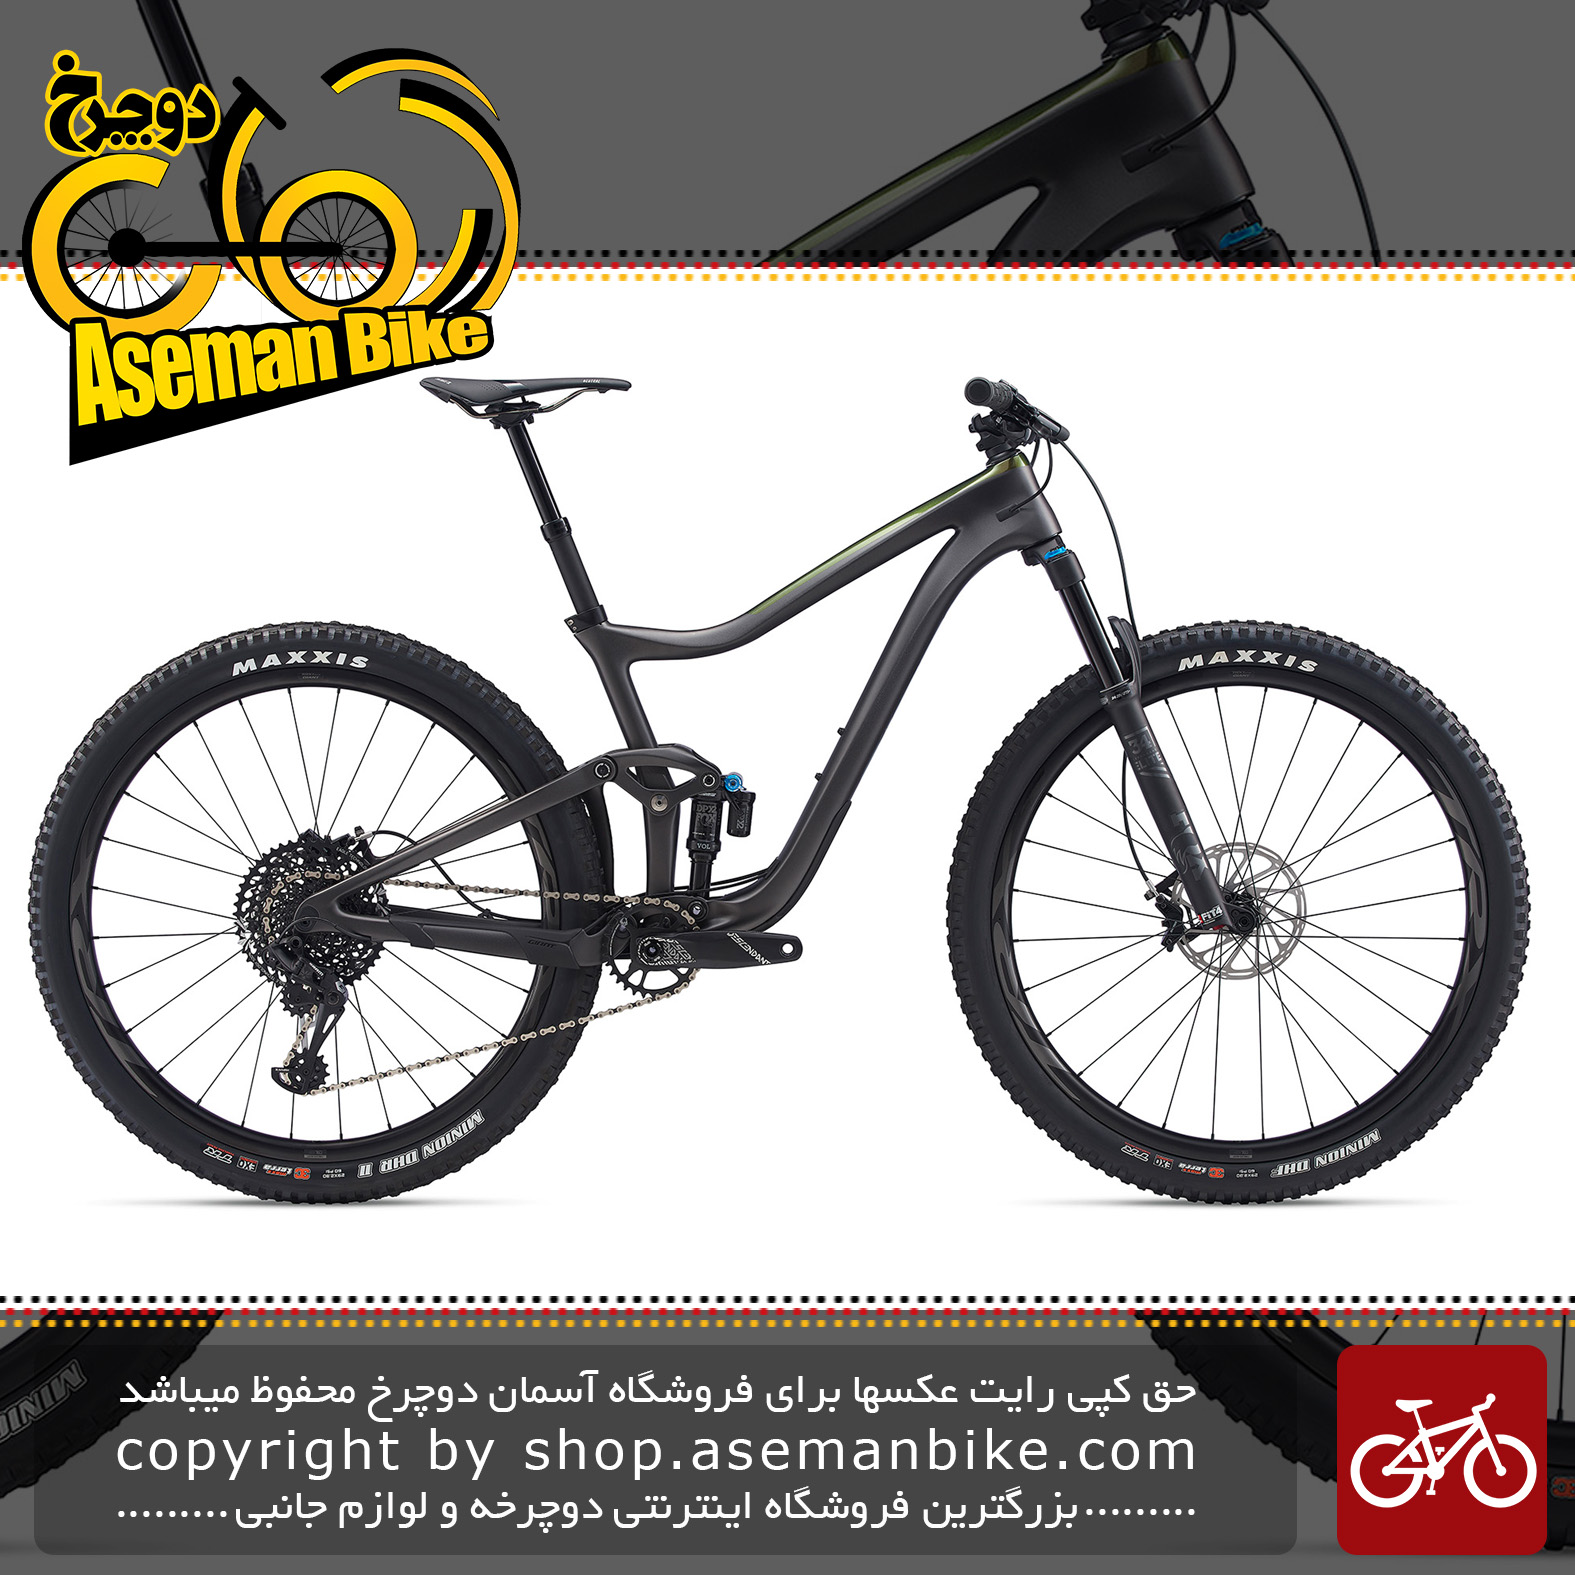 دوچرخه کوهستان جاینت مدل ترنس ادونس پرو 29 1 2020 Giant Mountain Bicycle Trance Advanced Pro 29 1 2020